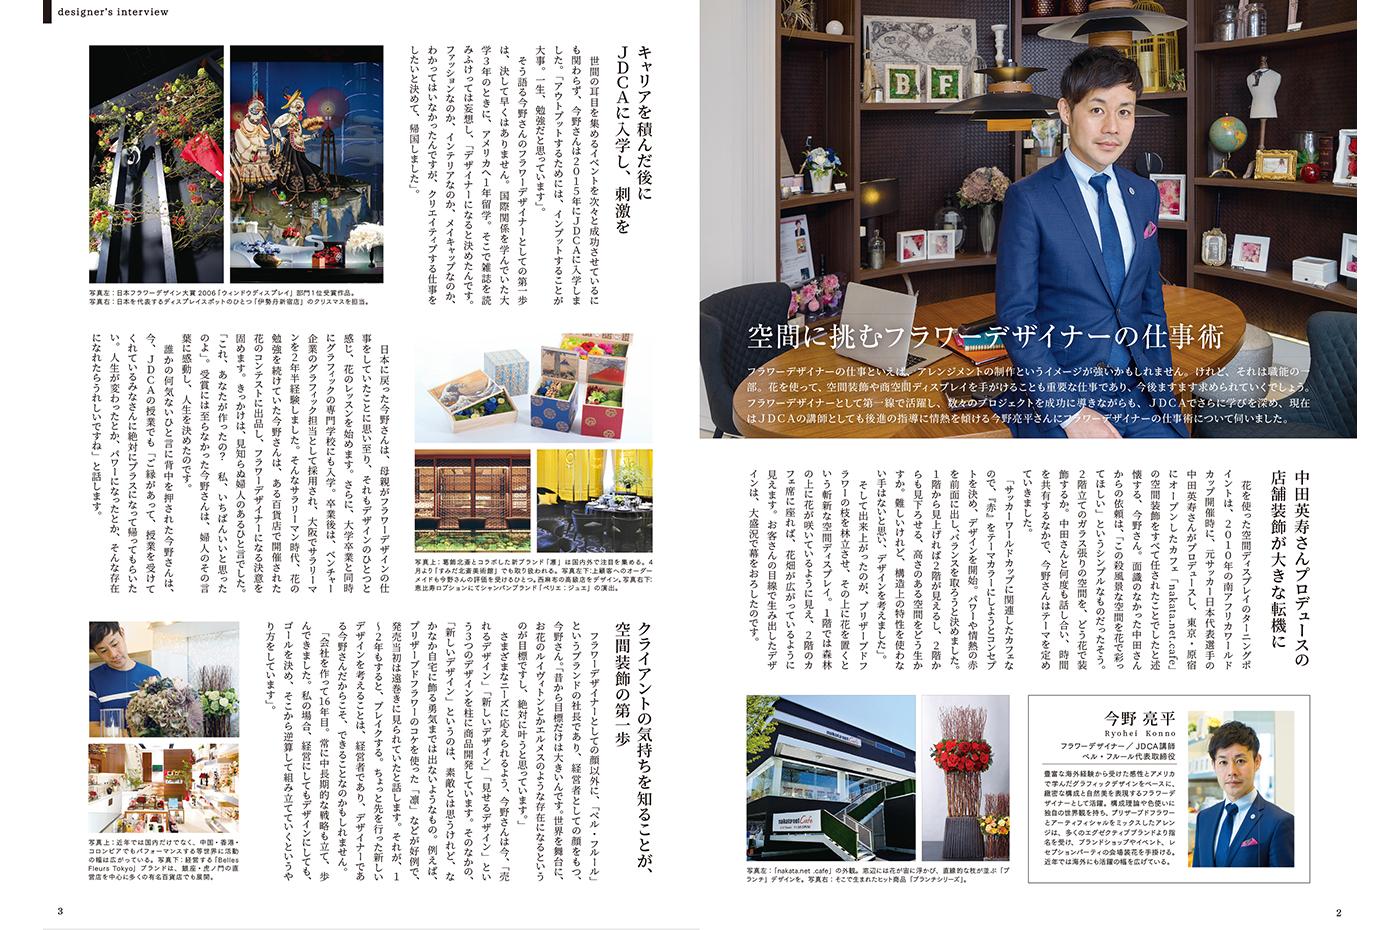 JDCA PRESS Vol.28表紙、巻頭特集に今野亮平掲載